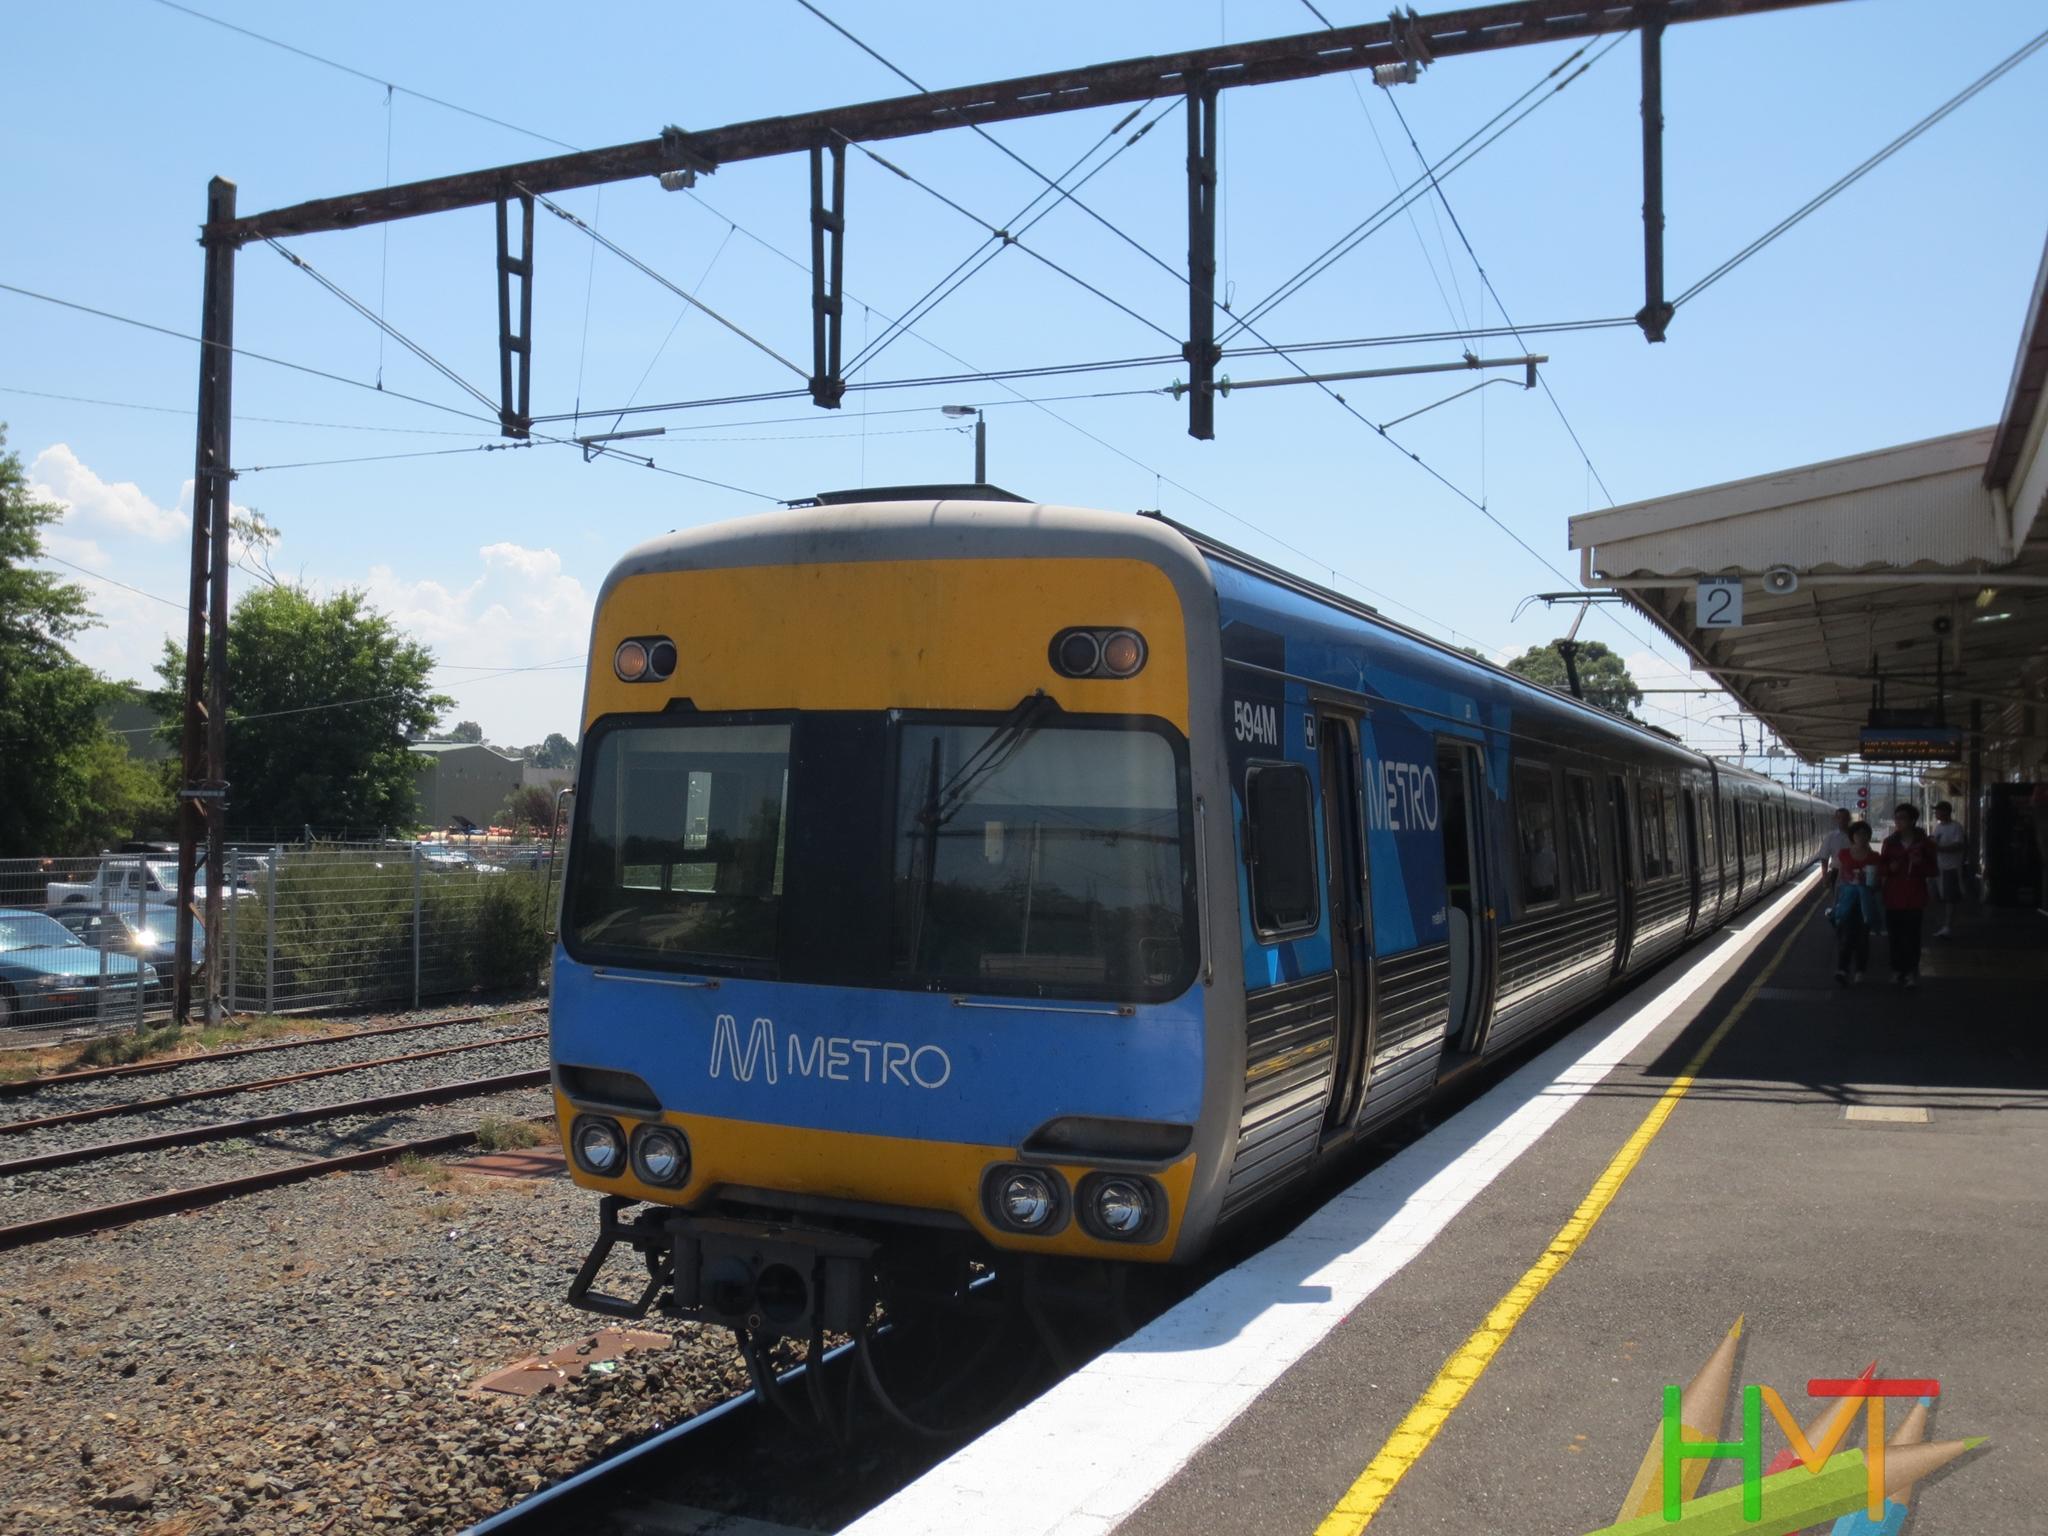 Melbourne's Train - Quiz 1